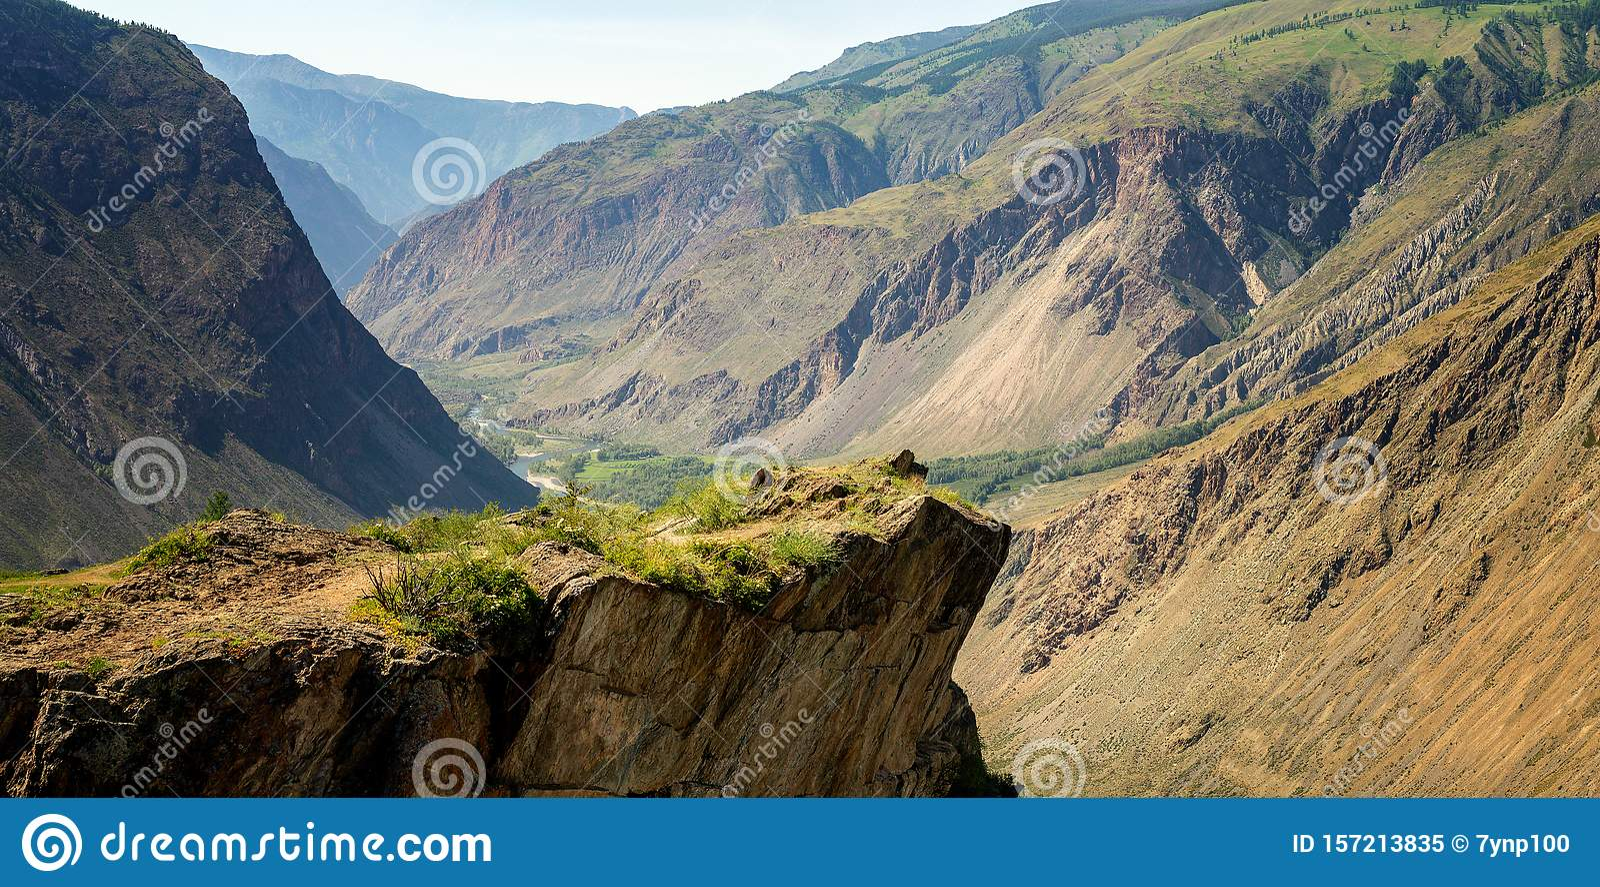 View of katu-Yaryk gorge, Gorny Altai, Russia